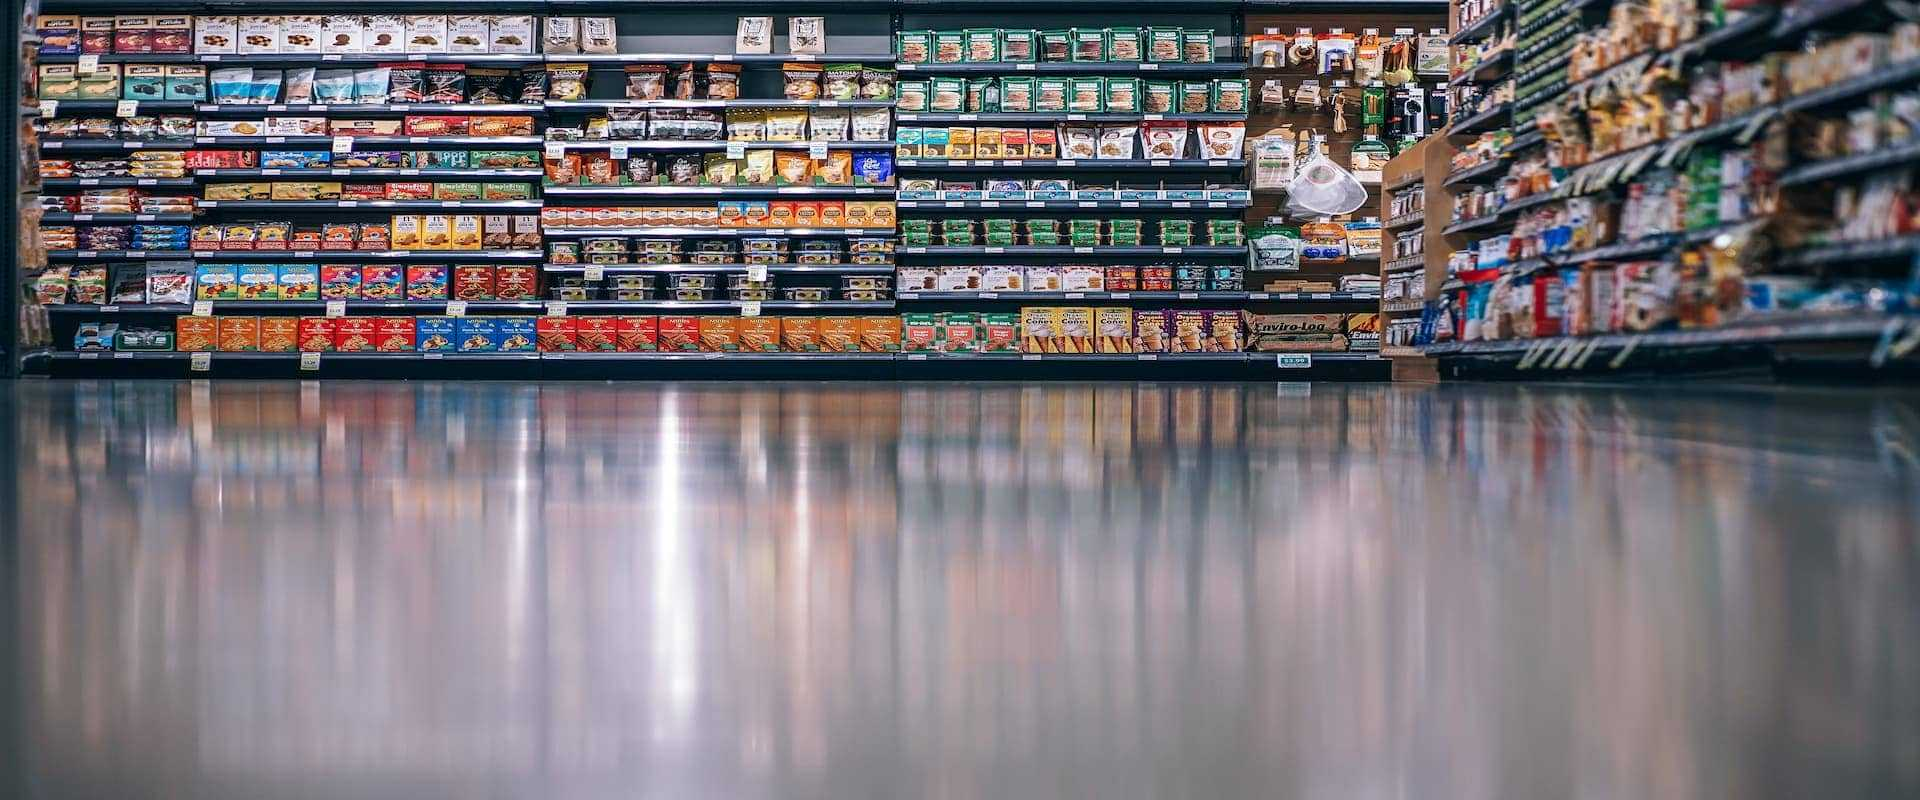 COSYS POS Software ideal für den Lebensmittelhandel